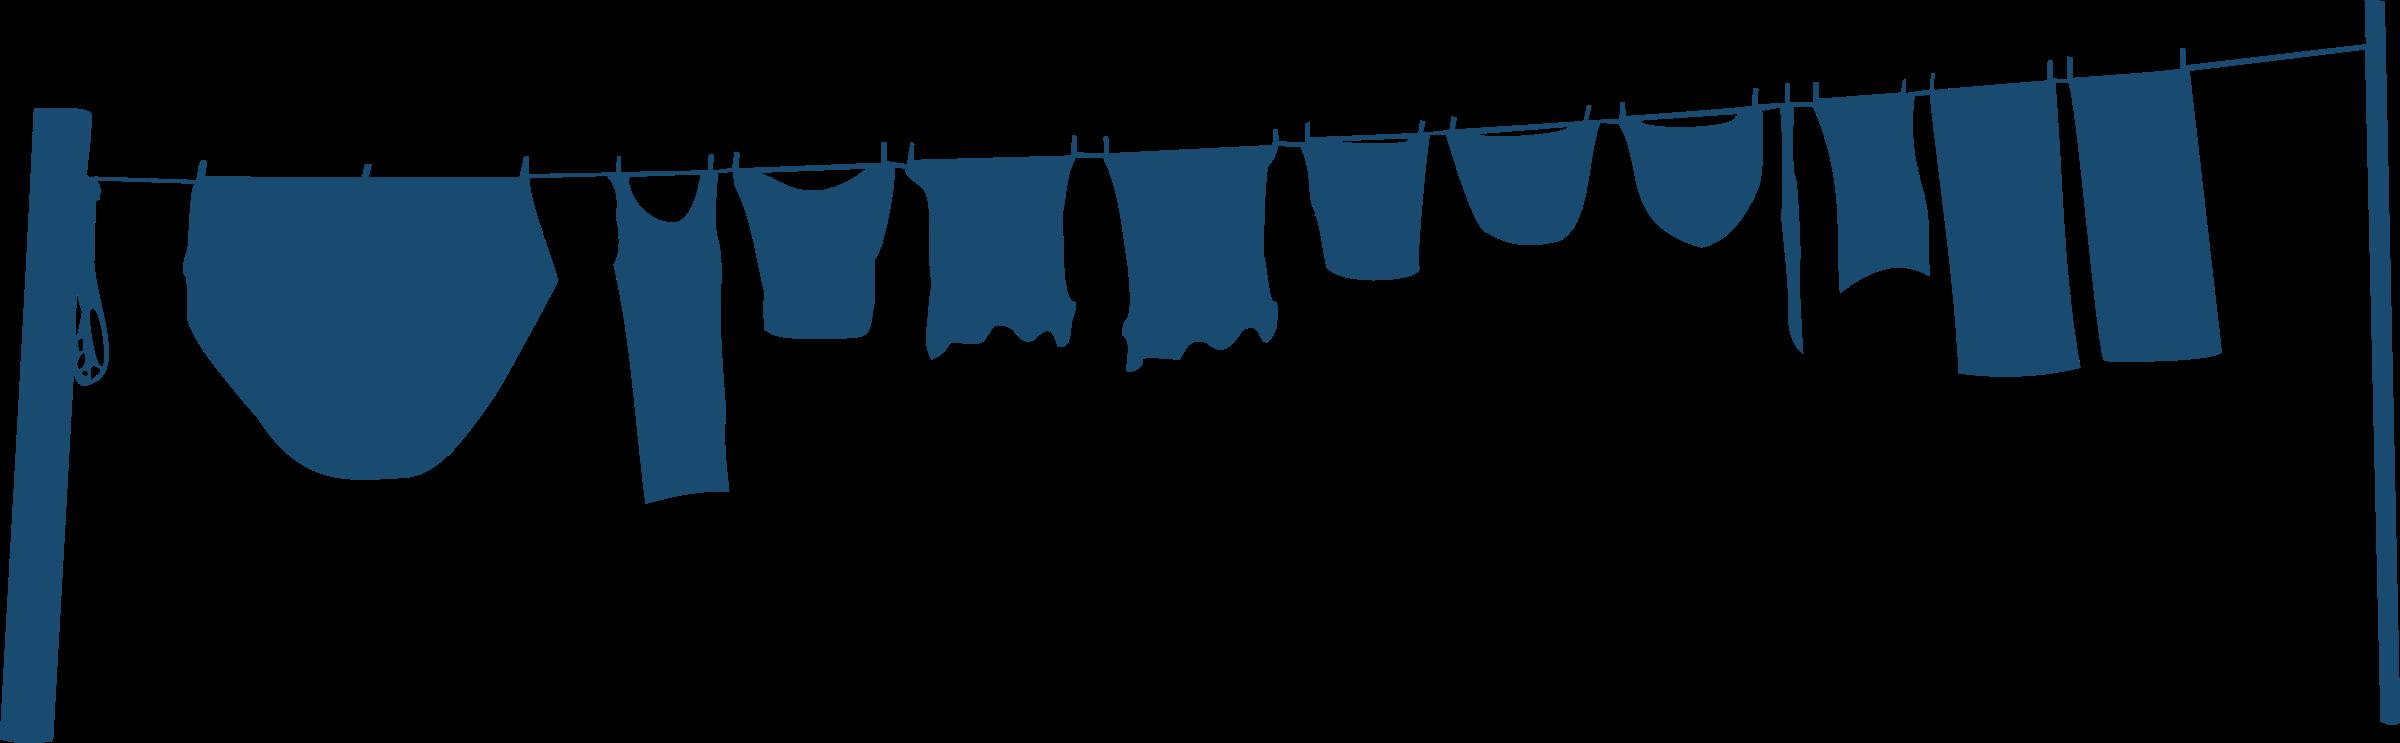 transparent download Washing clipart shirt. Clothes line big image